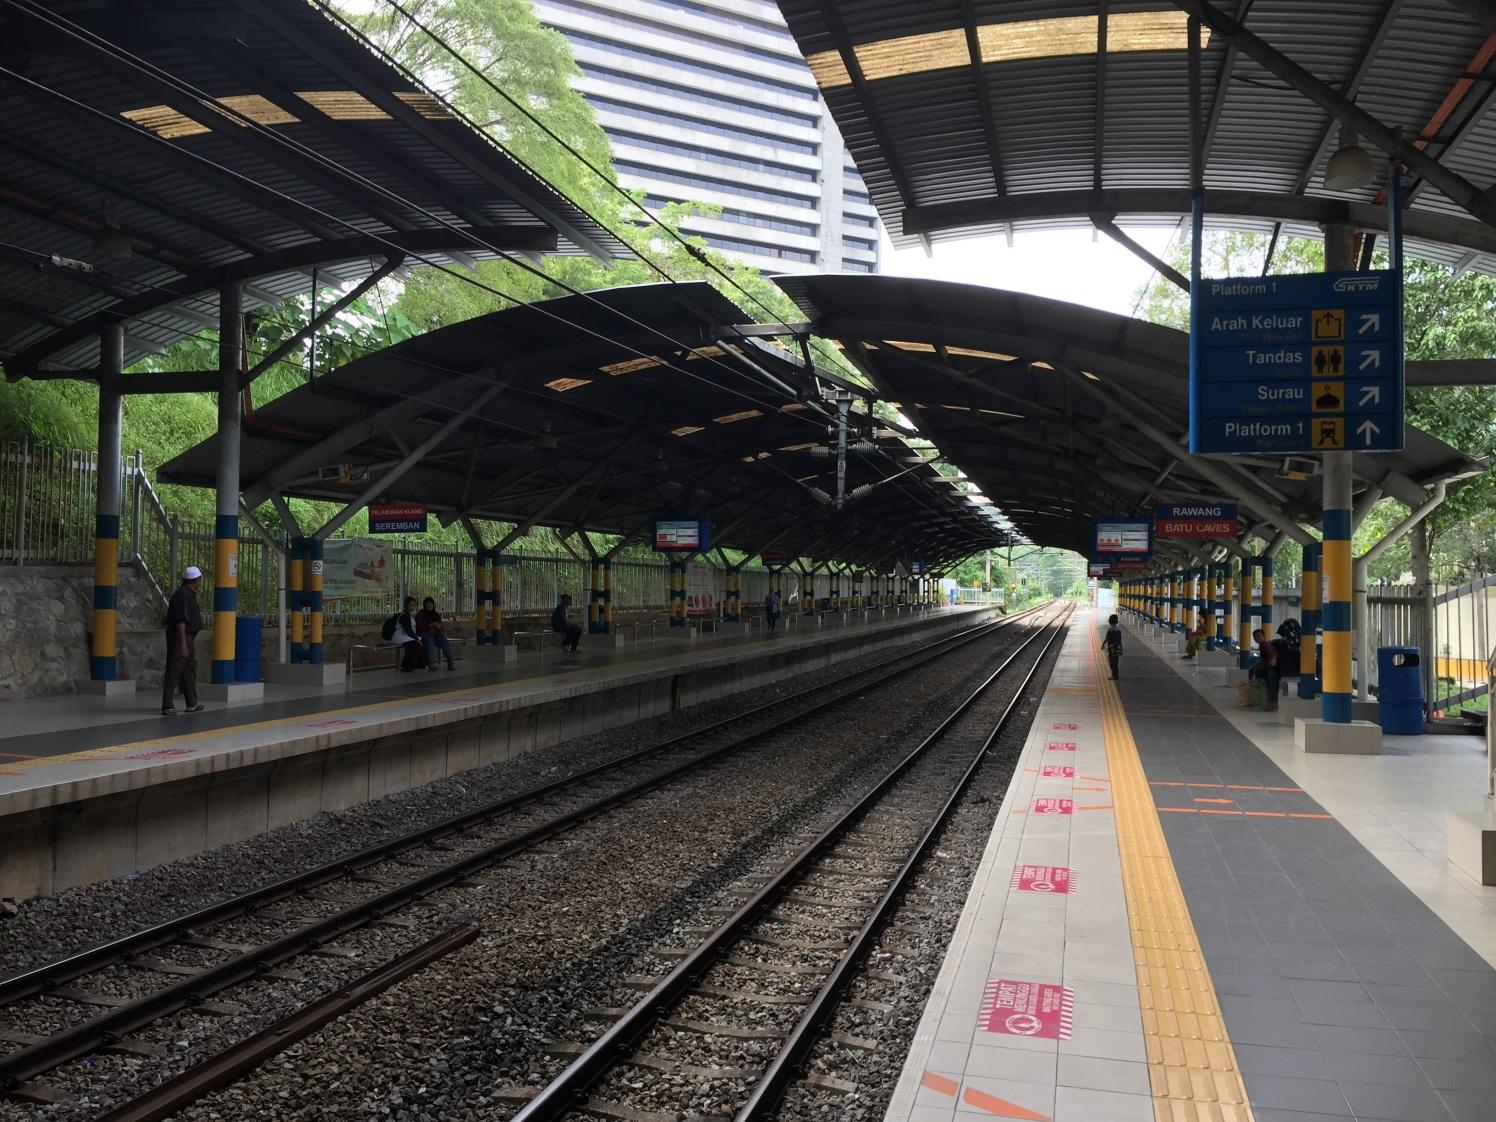 Komuter rail passenger waiting area to Batu Caves